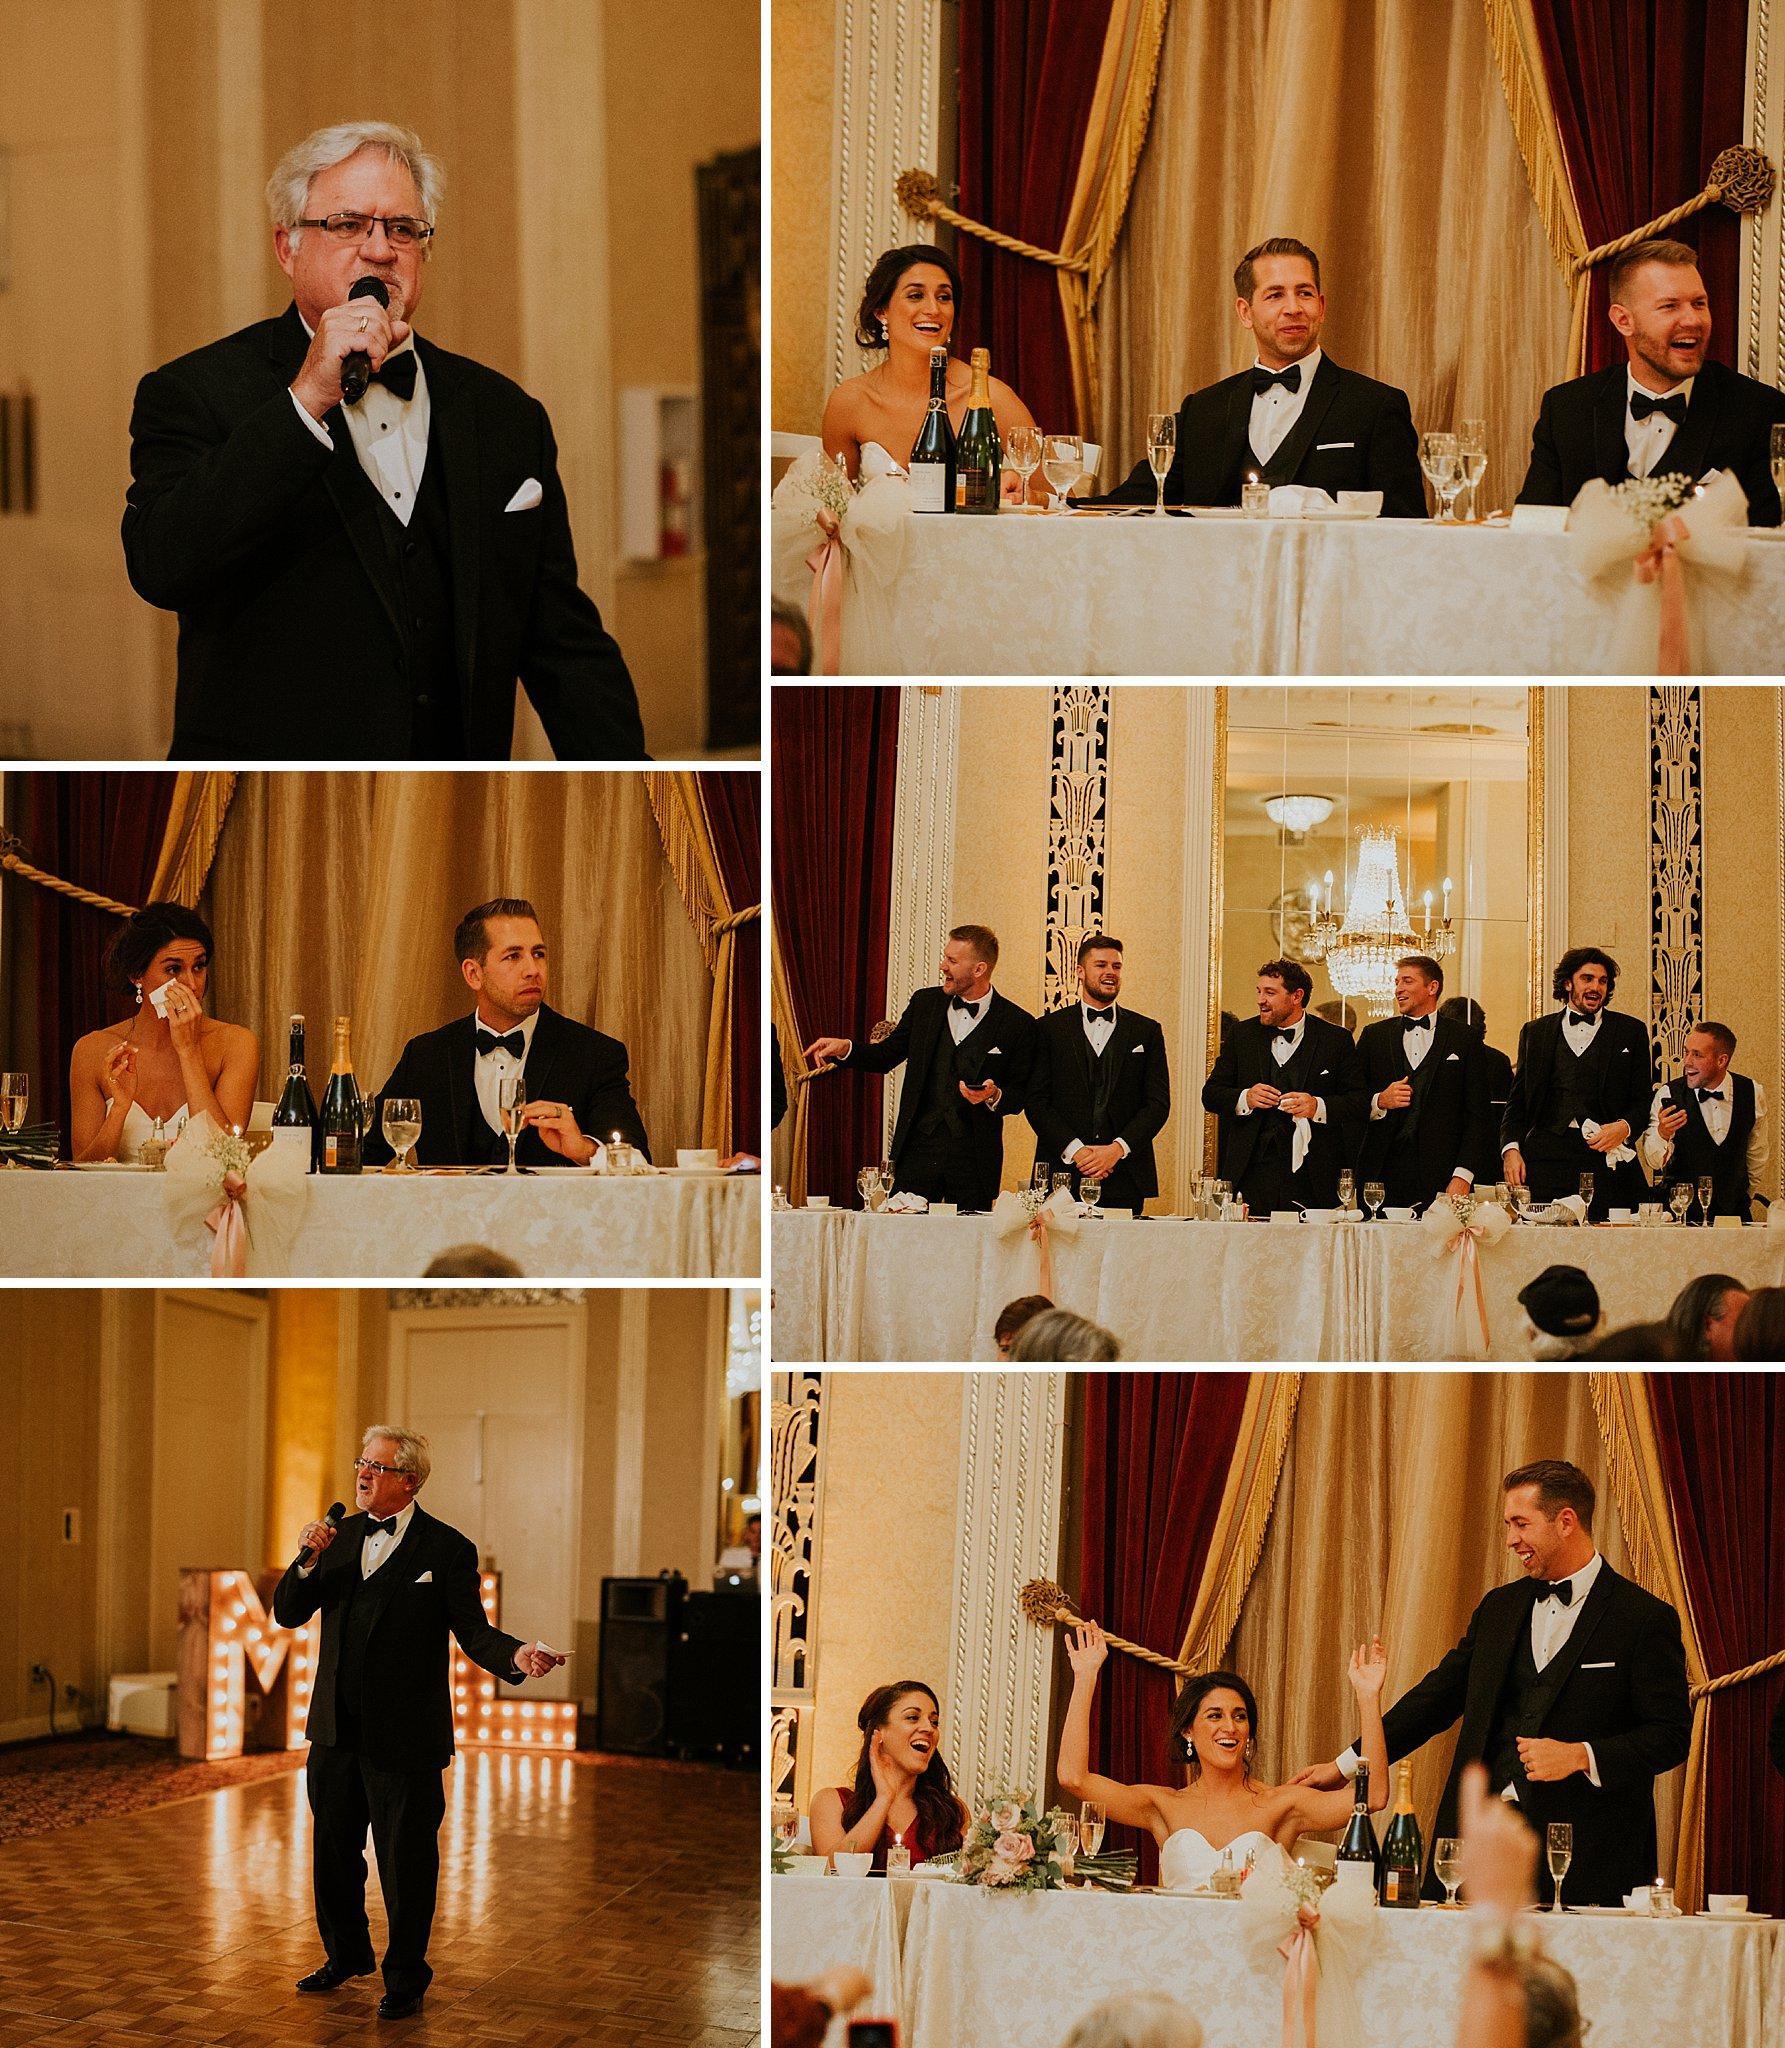 Matt-Lauren_St-Marys_Hilton-City-Center-Milwaukee-Wedding_liller-photo_0074.jpg